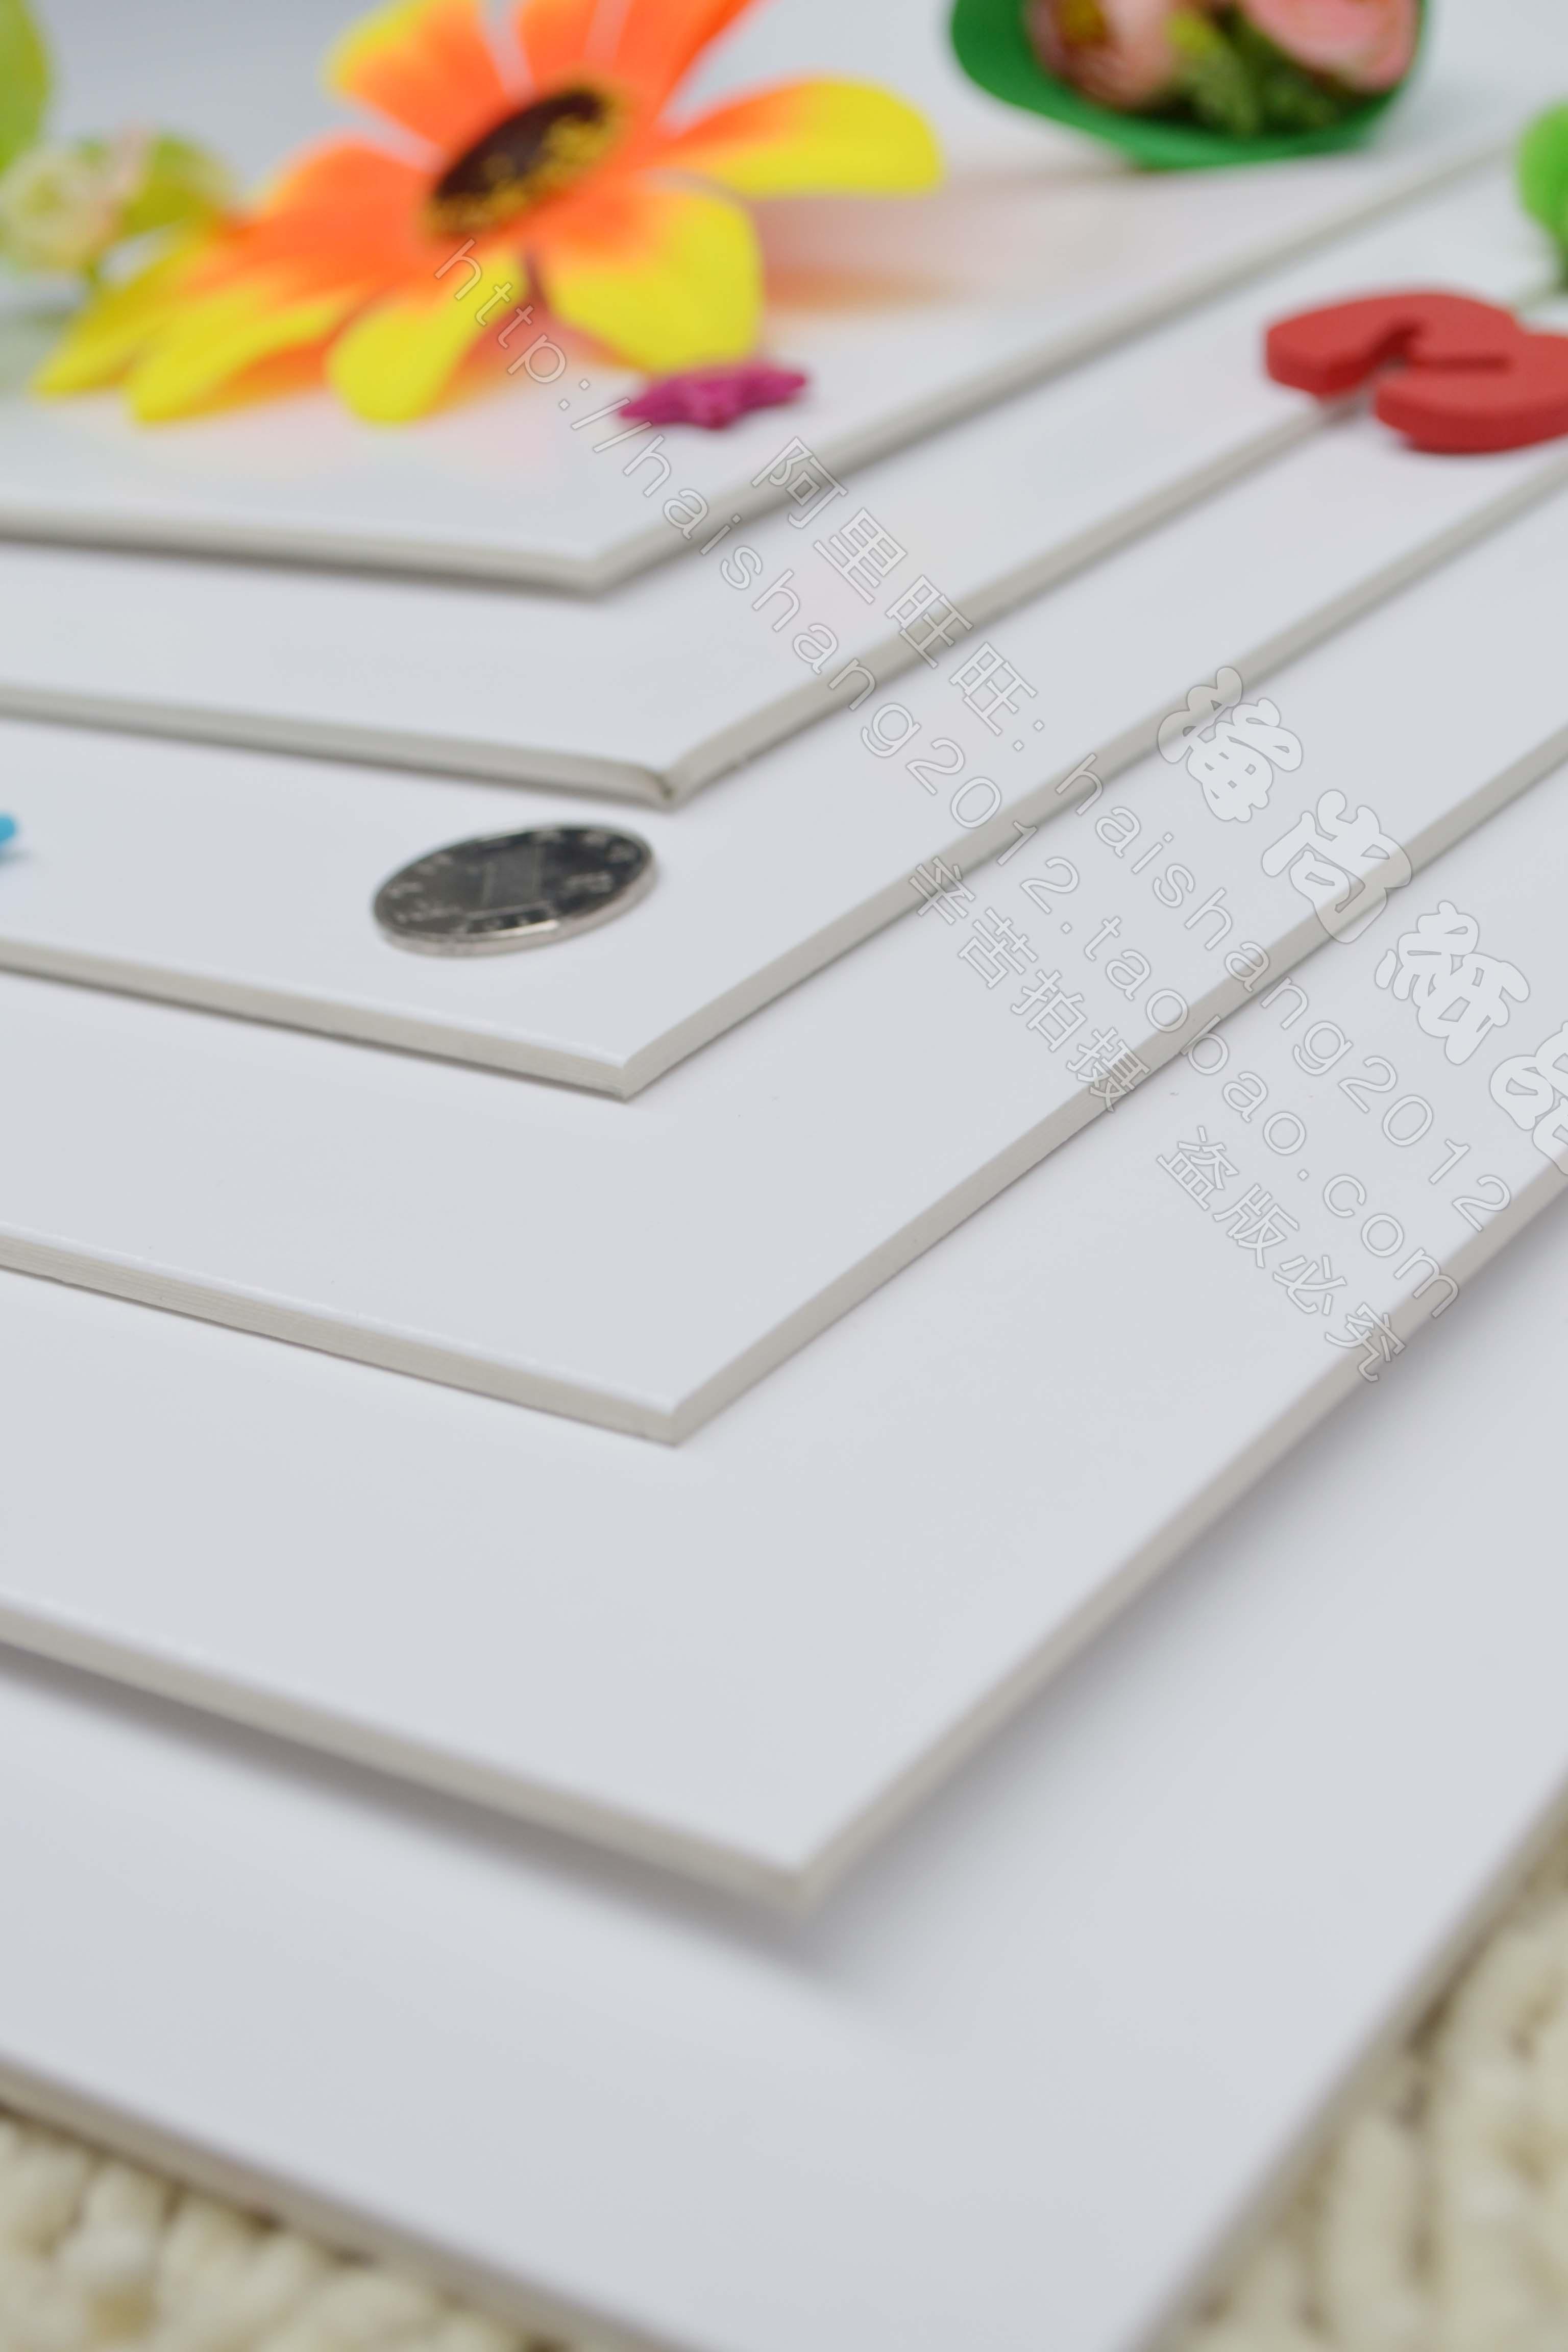 Cadre photo papier fashion designs - Cadre photo a3 ...